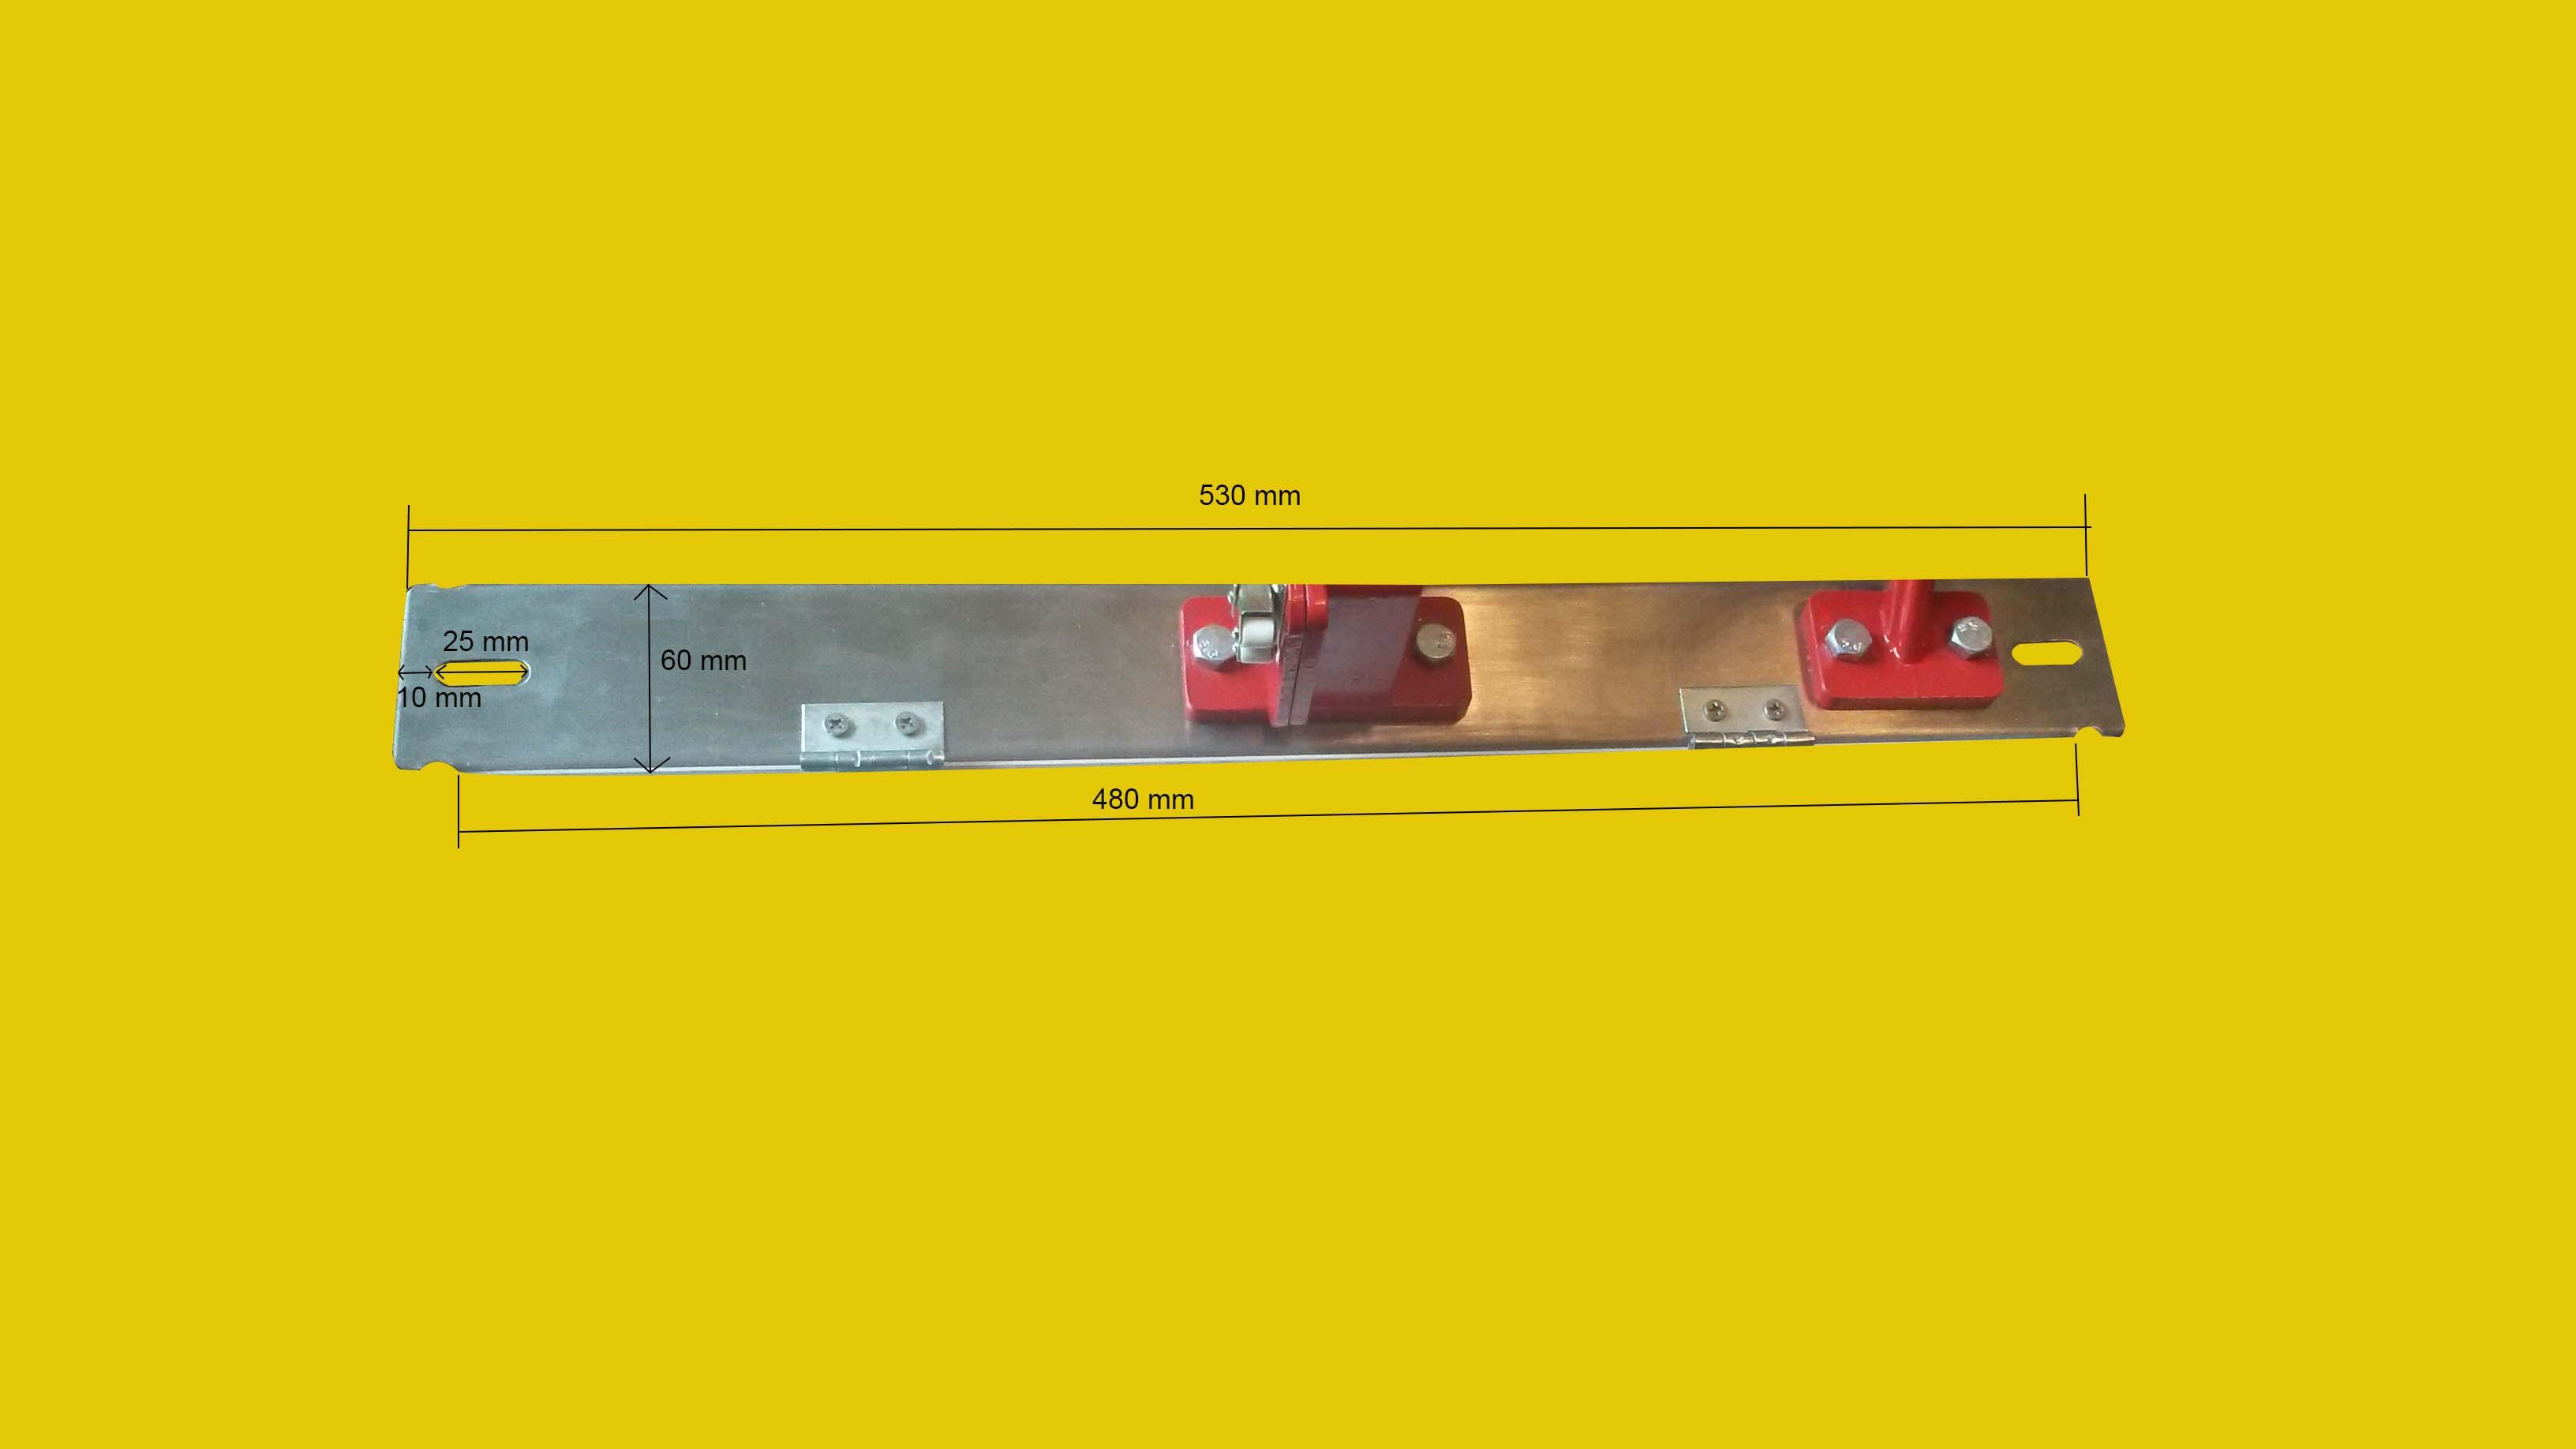 10 Stück Neodym Kegelmagnete Push Pins Pinnwand Büro Whiteboard Gelb 19x25 mm